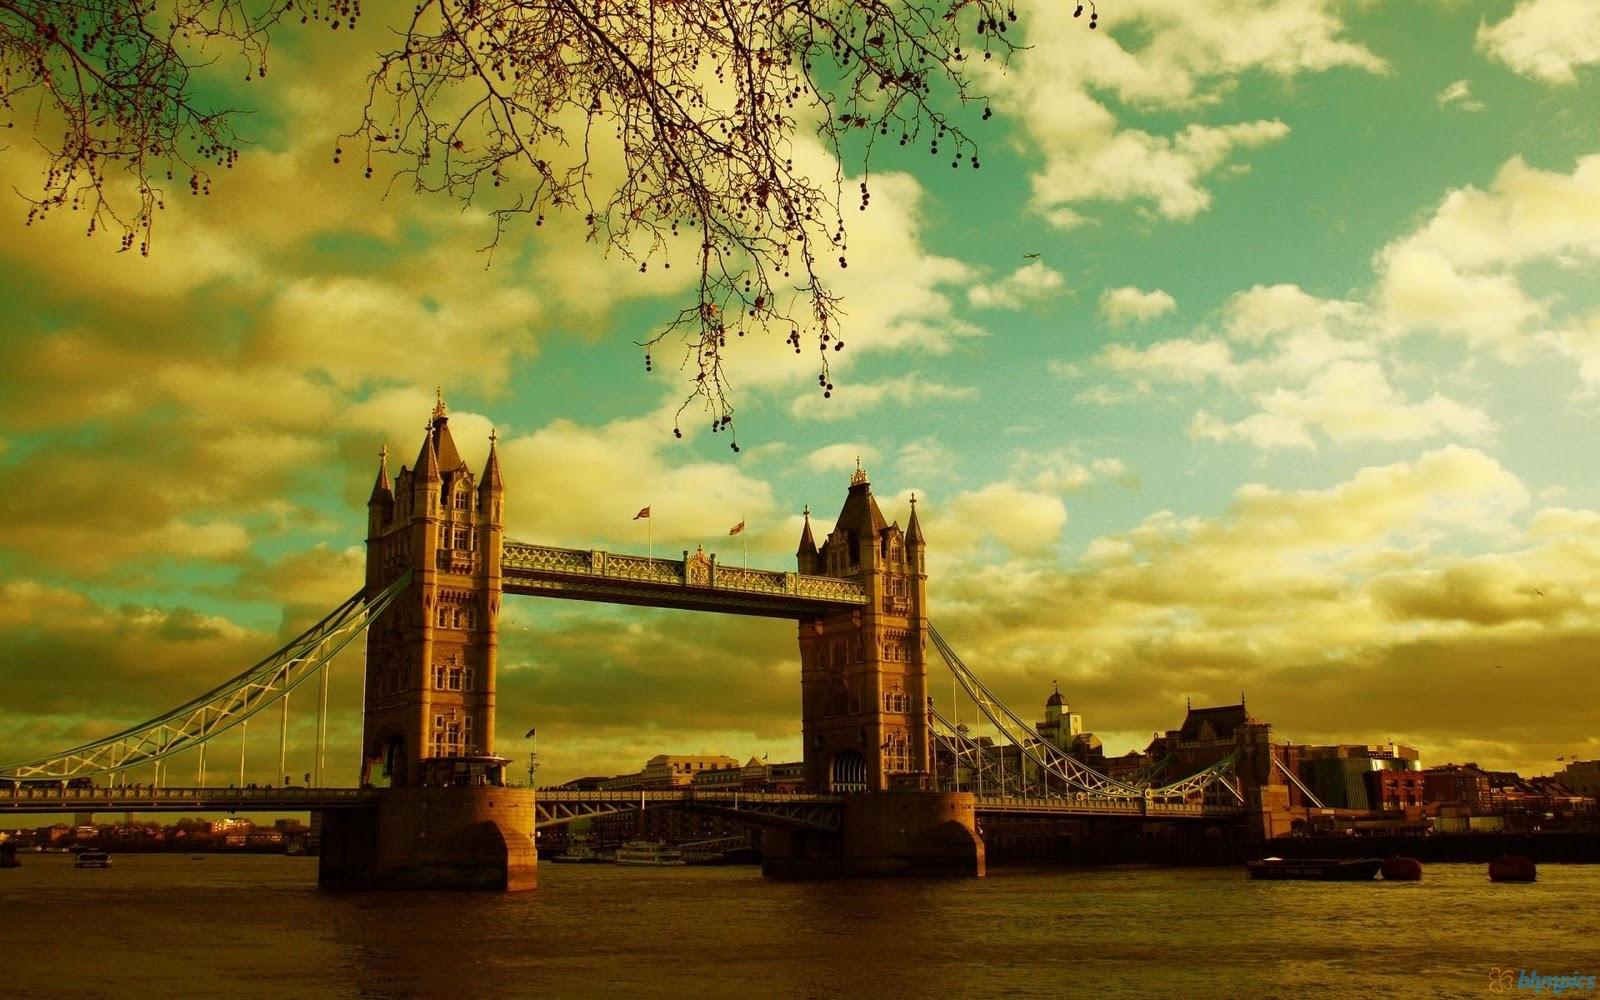 http://1.bp.blogspot.com/--cuqEJrZLIE/TuhHEc_5B_I/AAAAAAAAAjk/b1GoyONSNXE/s1600/tower_bridge-1920x1200.jpg